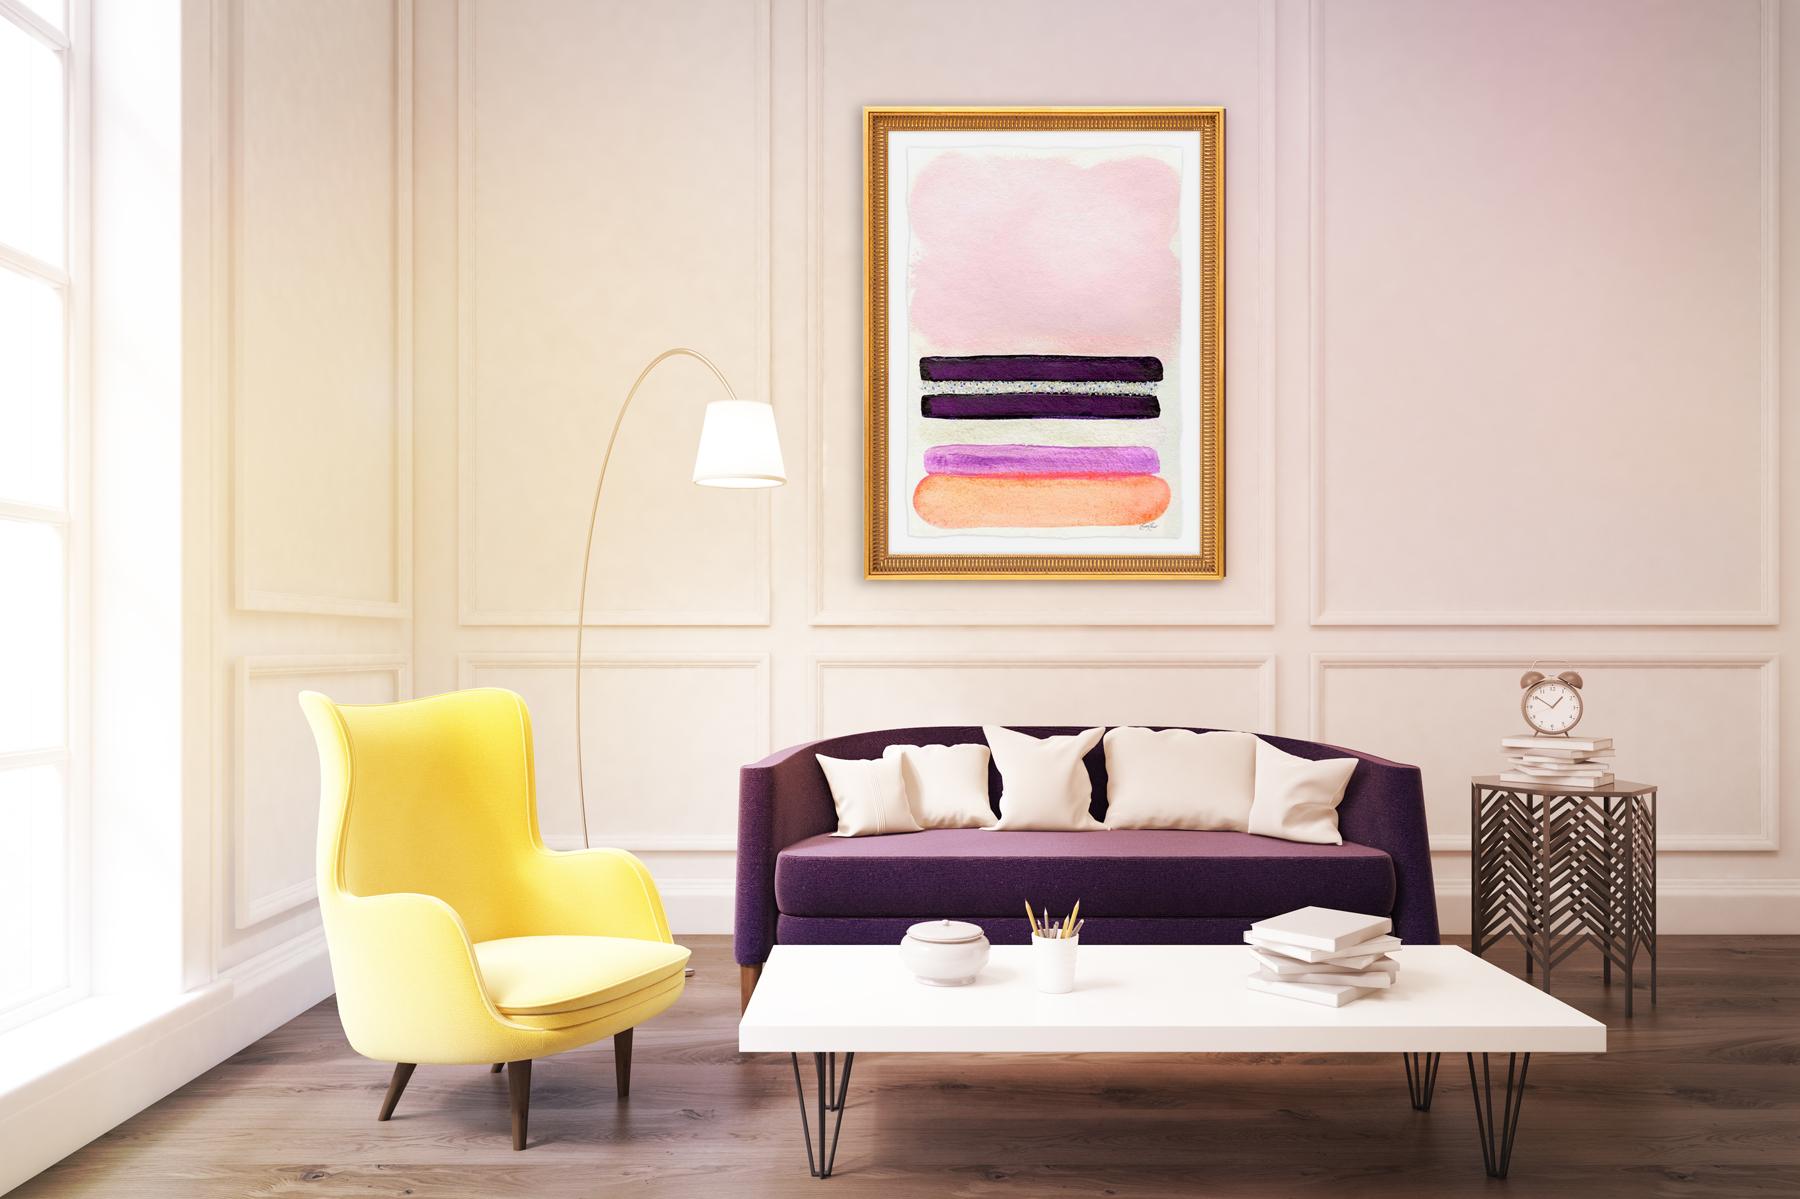 Kristi-Kohut-art-homes-colorful846.jpg